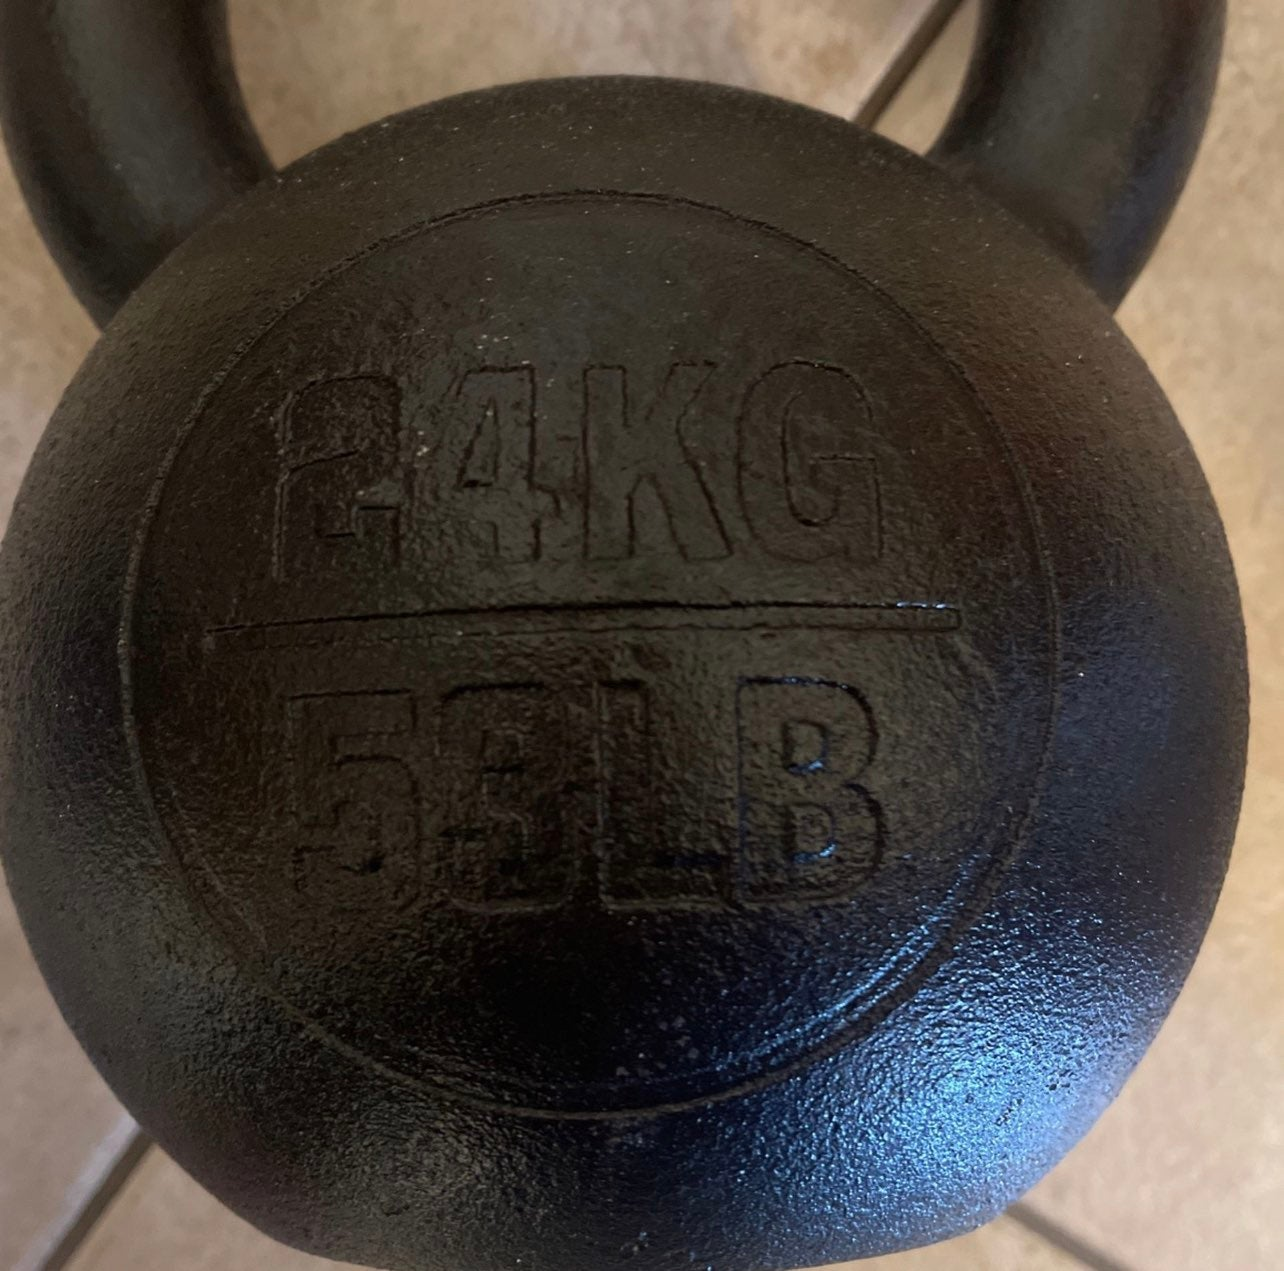 Rogue fitness crossfit kettlebell 53lbs